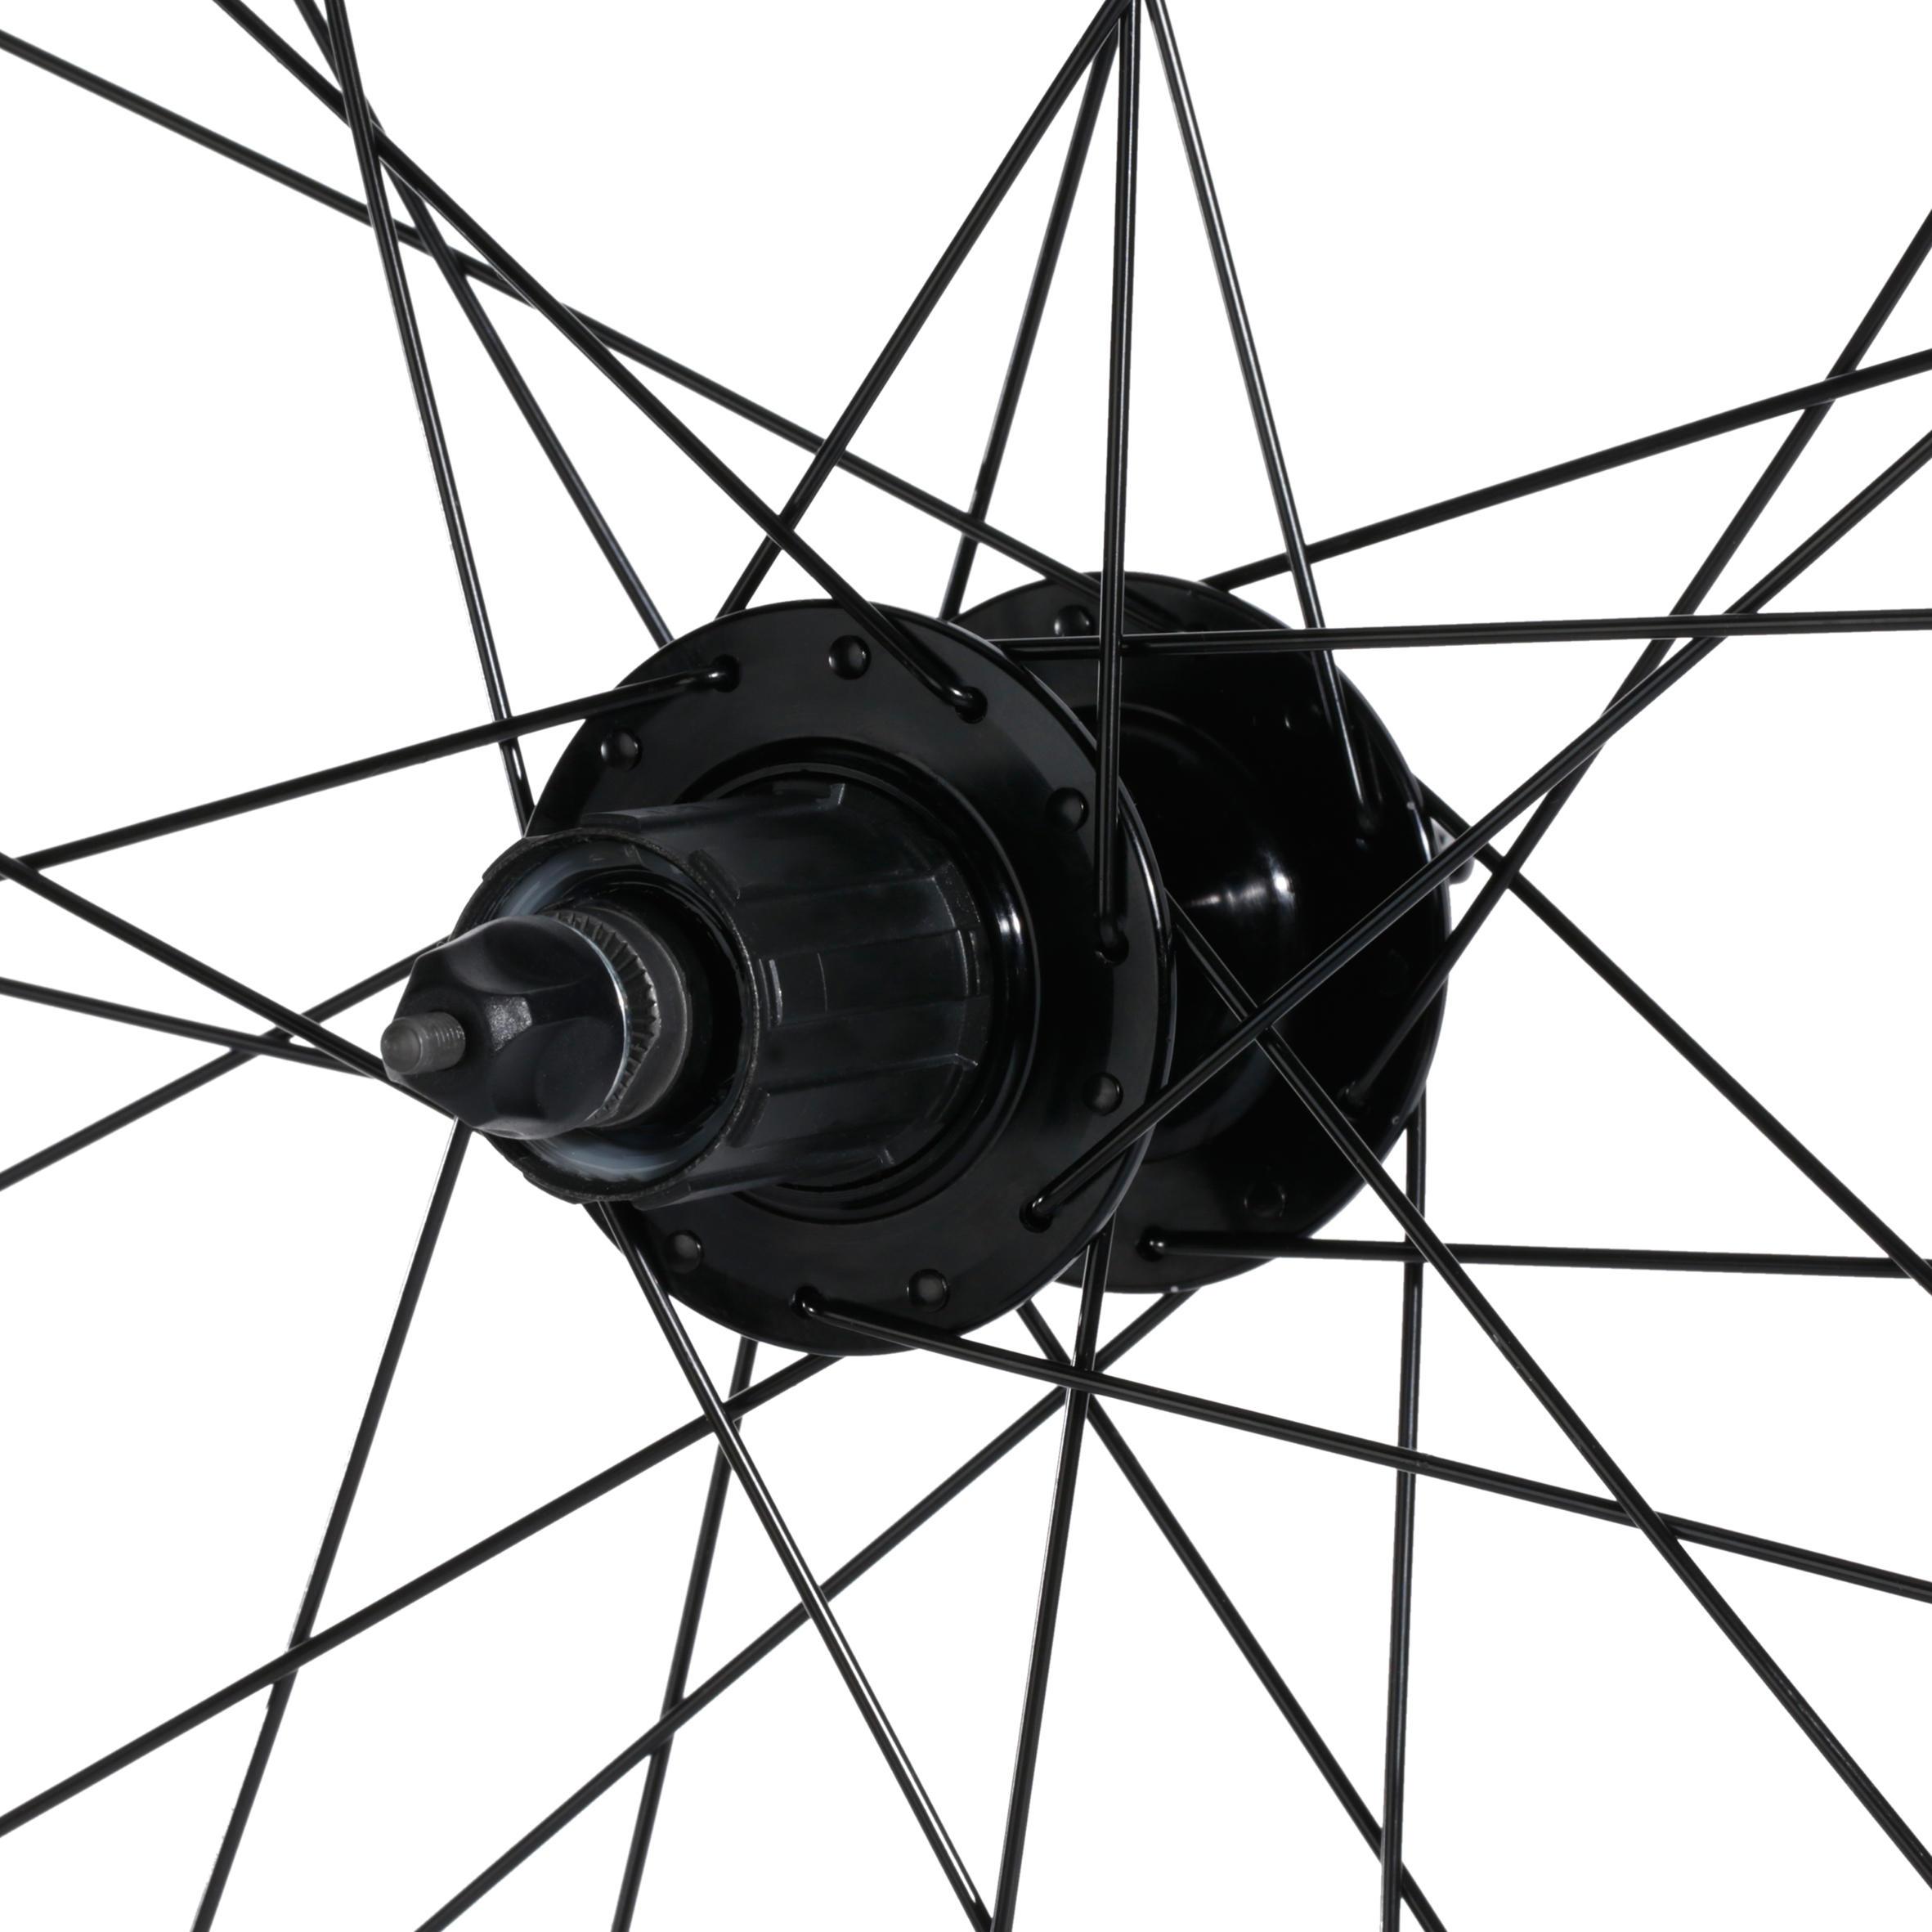 27.5_QUOTE_ Disc Brakes & Cassette Double-Wall Rim Mountain Bike Rear Wheel - Black